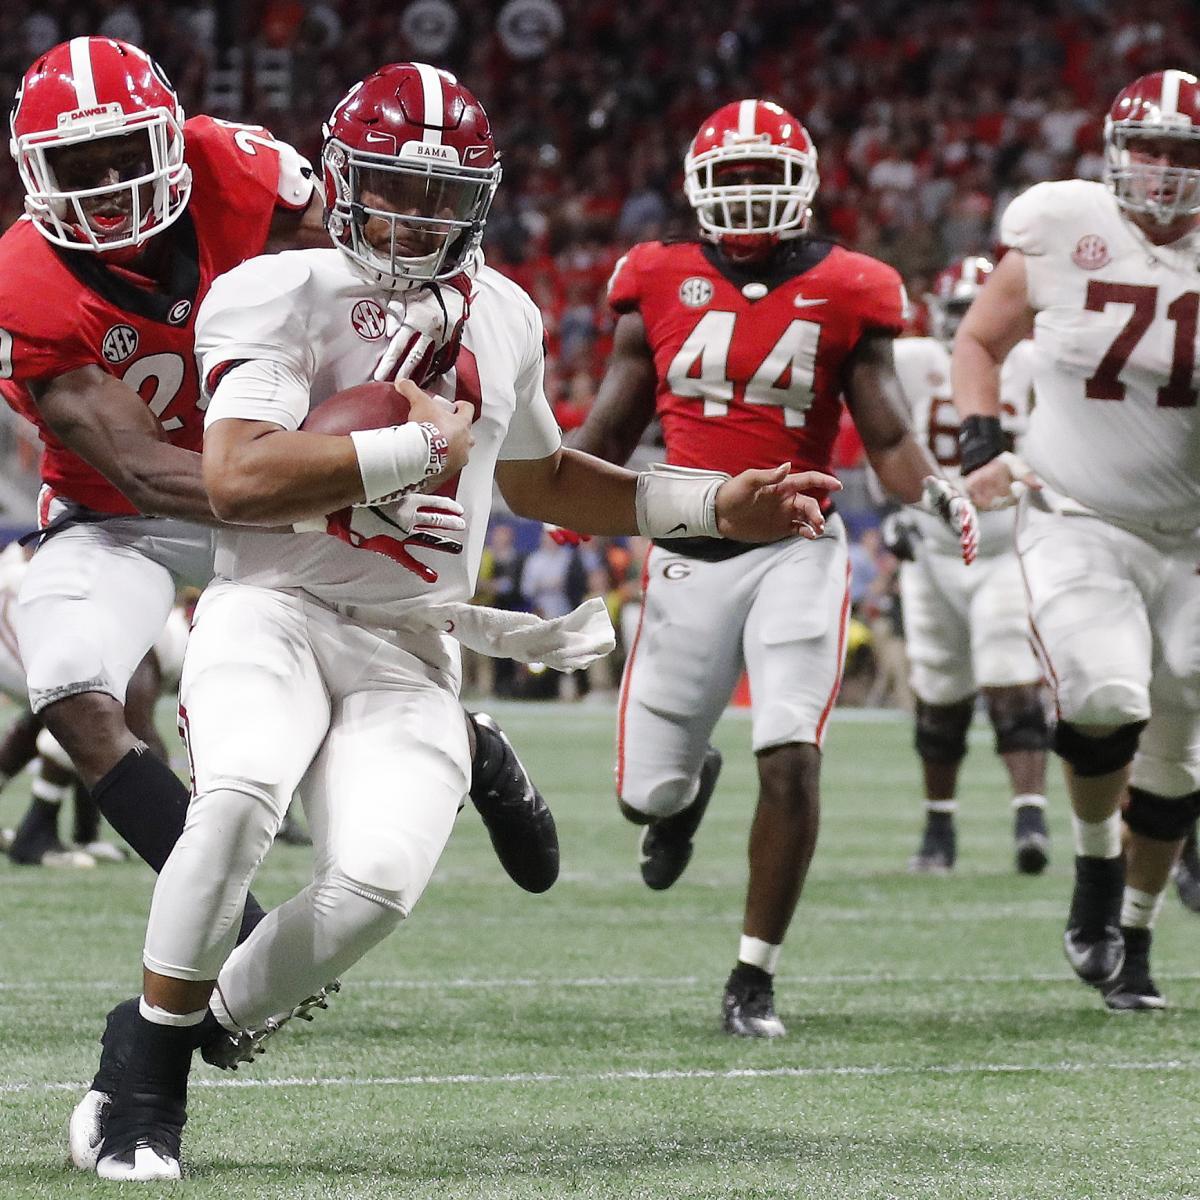 NCAA Football Rankings 2018: Week 15 Predictions Based On